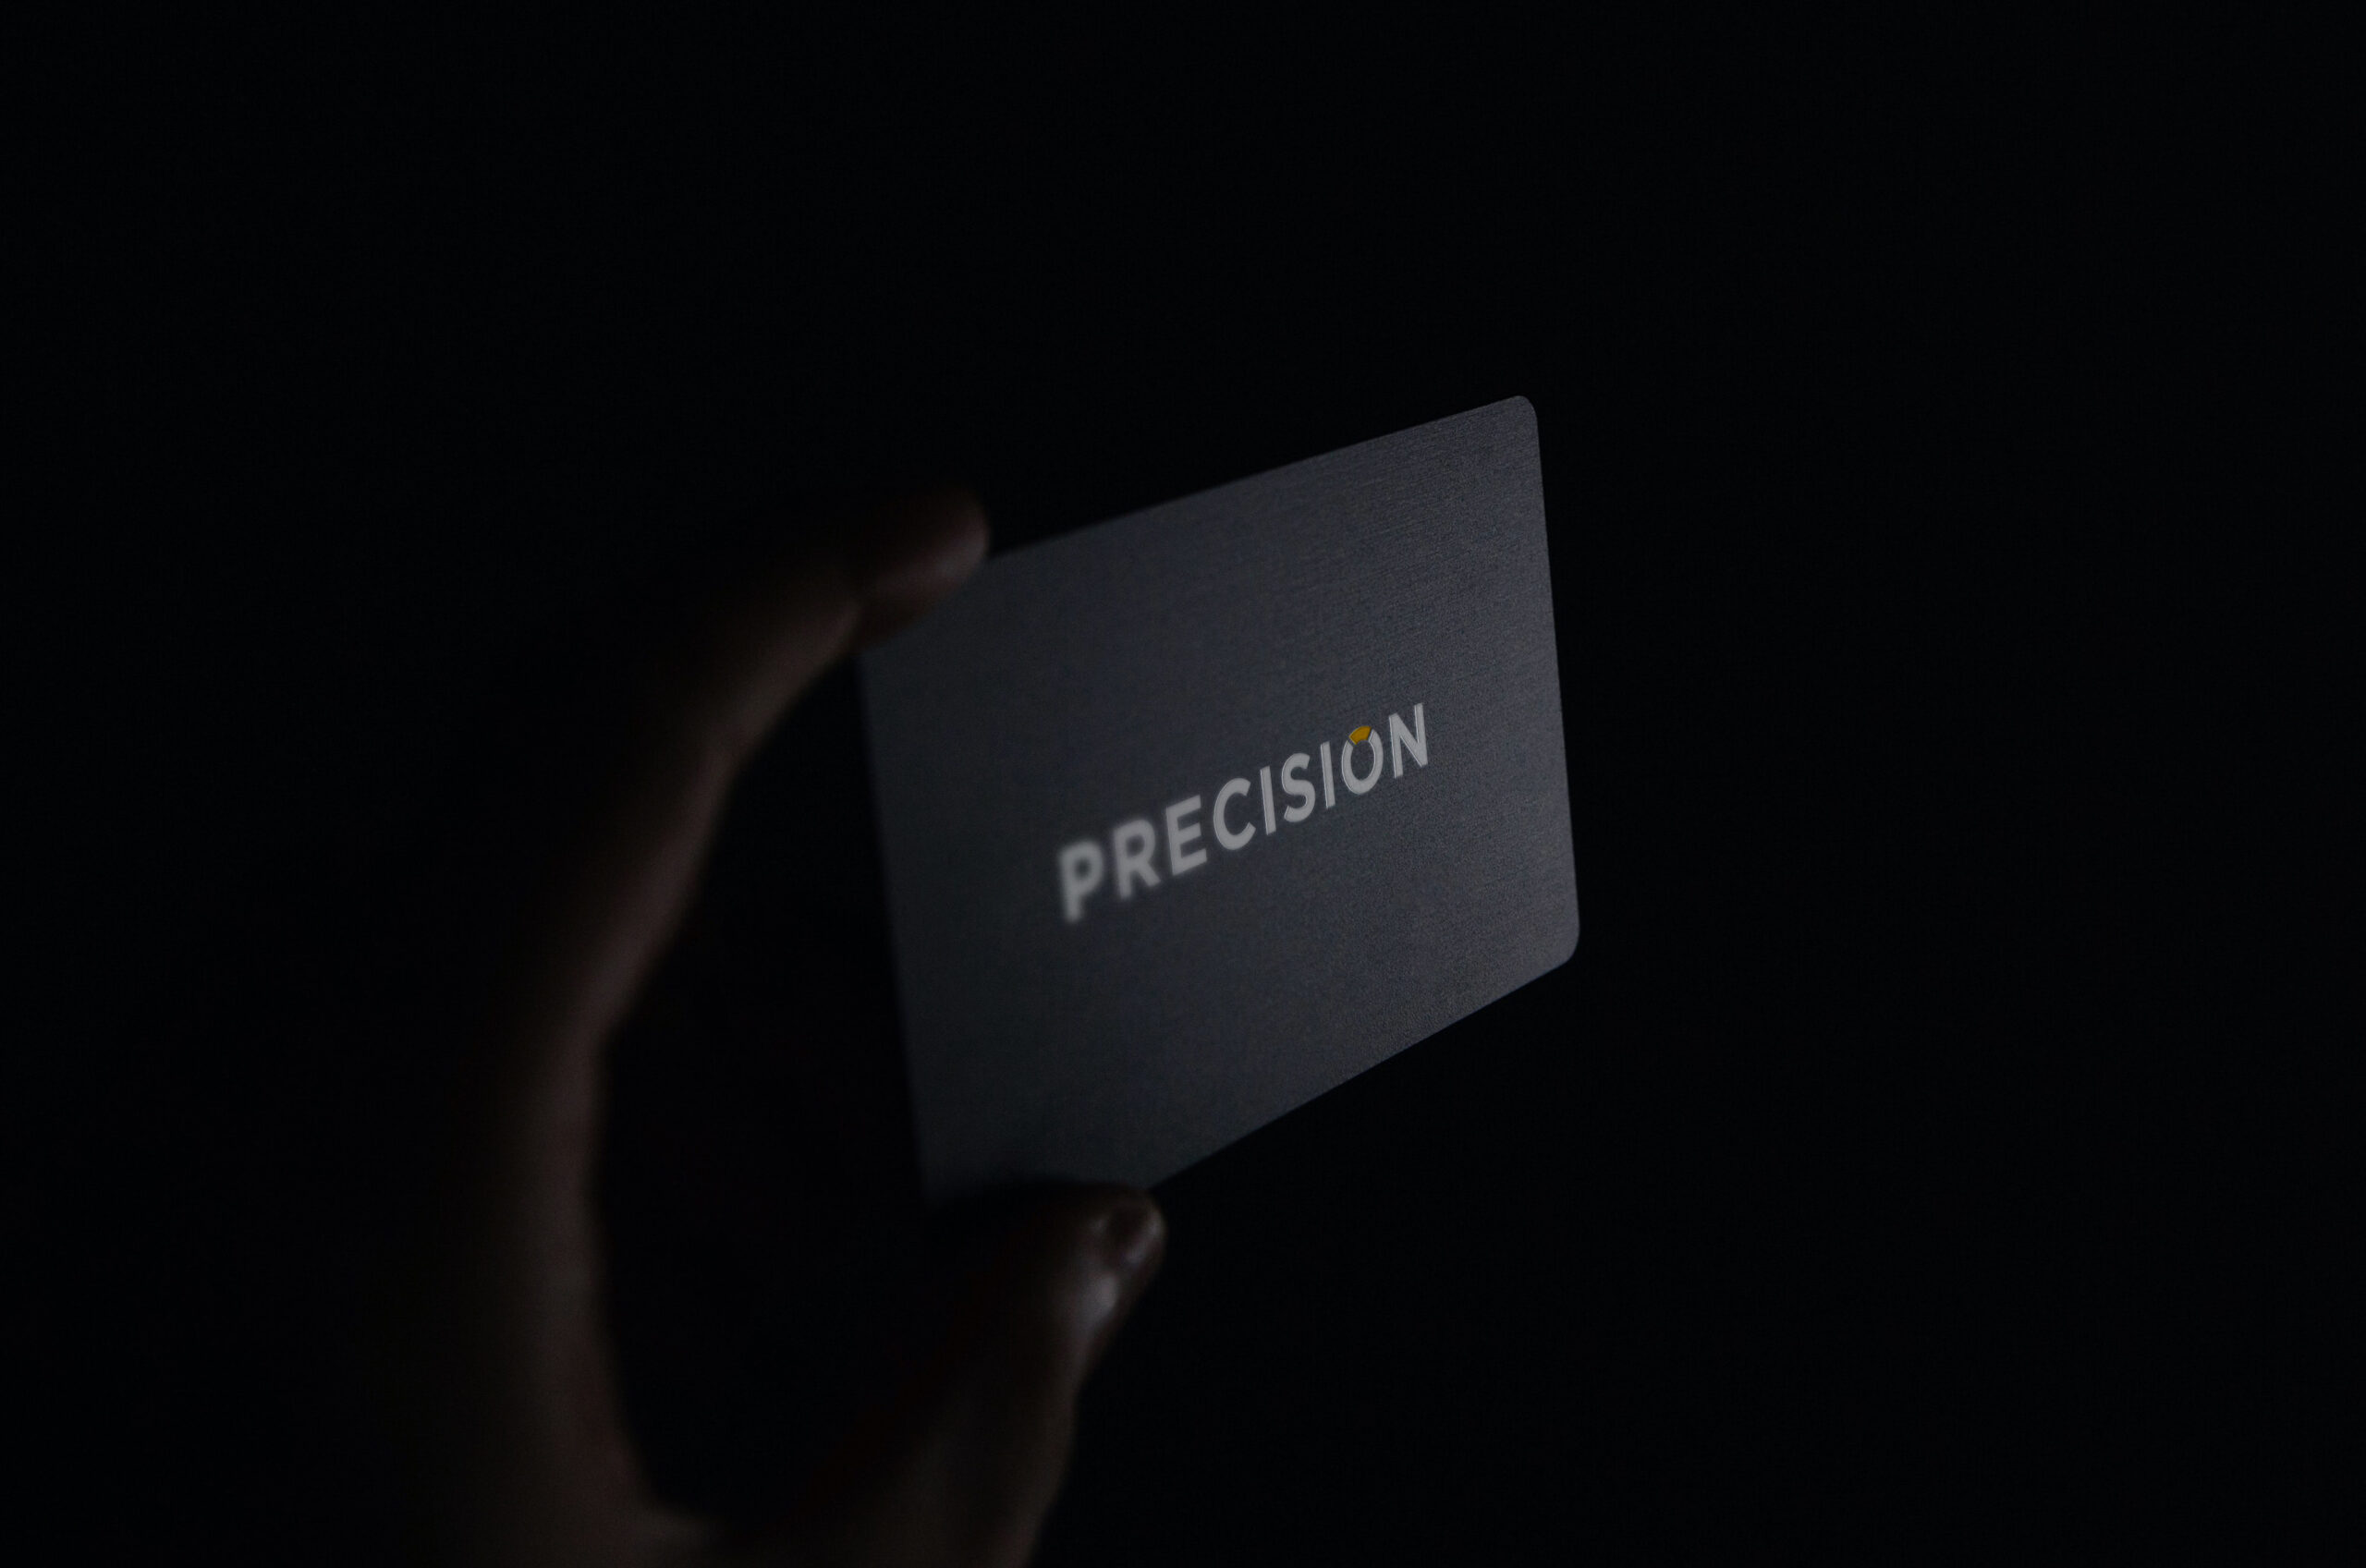 Tarjeta de presentacion PRECISION